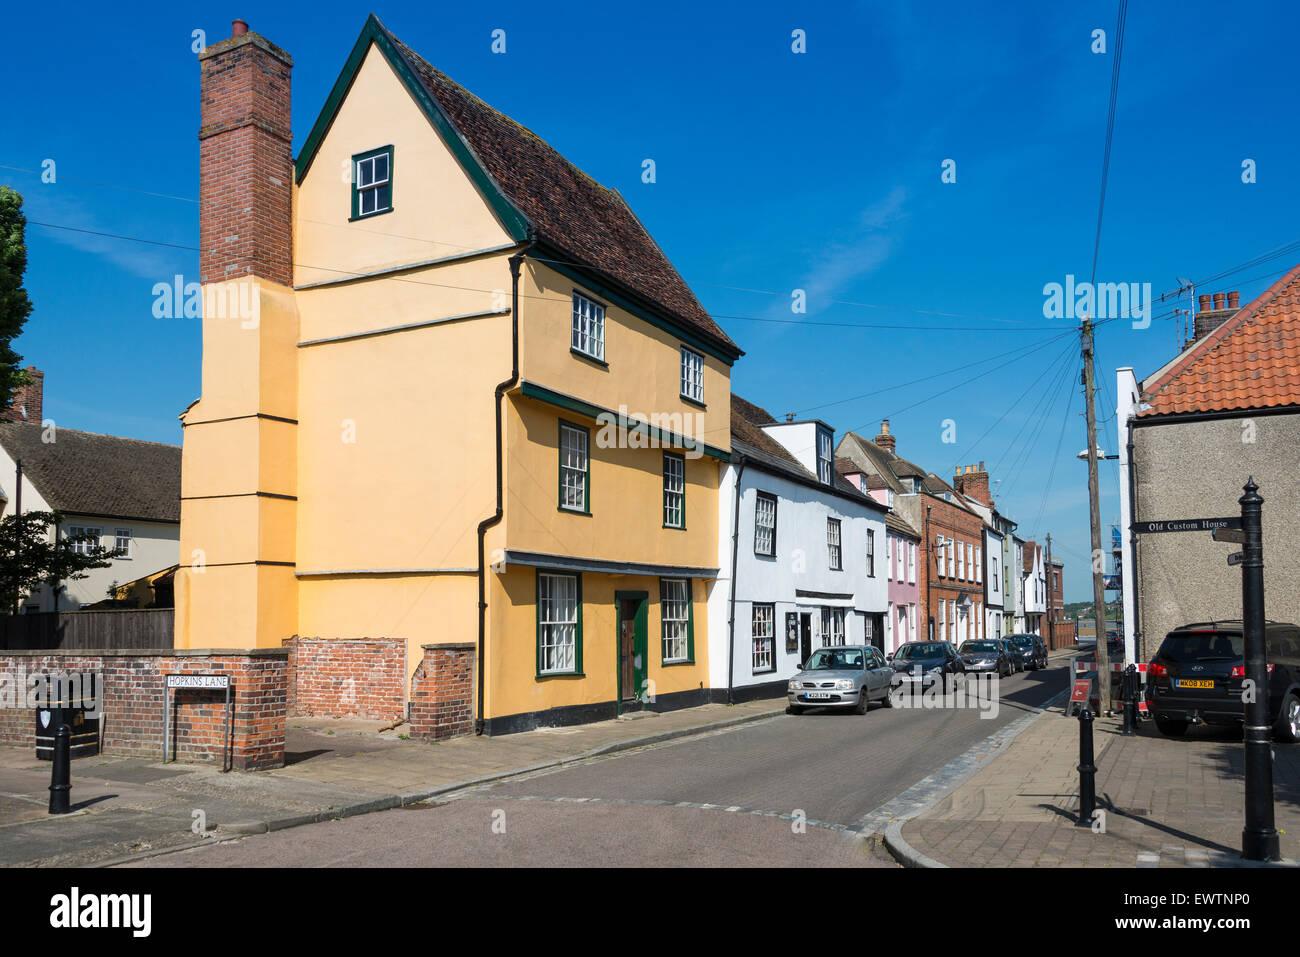 Medieval houses on King's Head Street, Harwich, Essex, England, United Kingdom - Stock Image